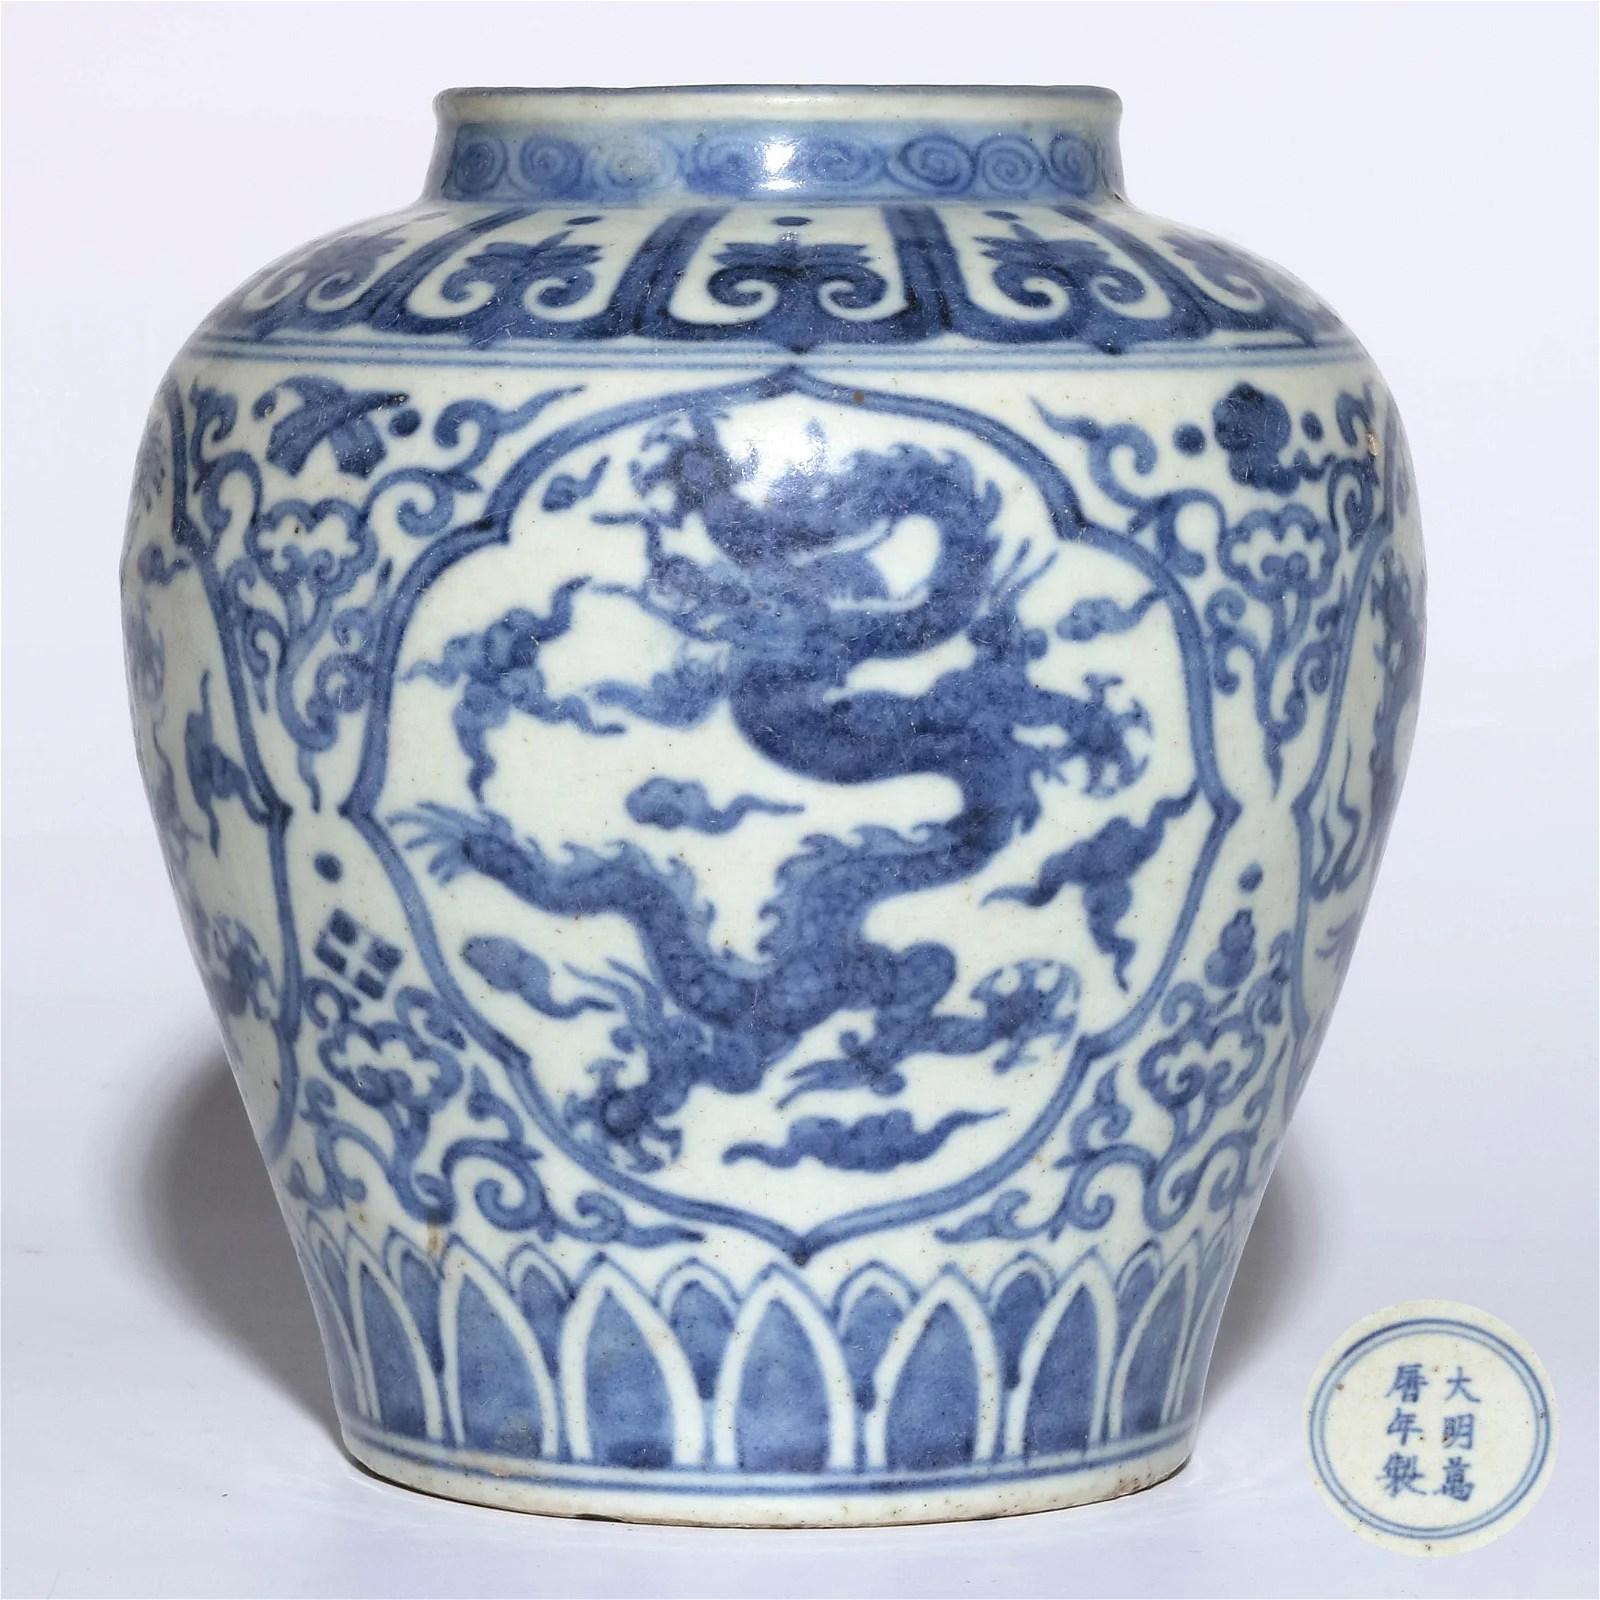 A BLUE AND WHITE DRAGON JAR, WANLI MARK